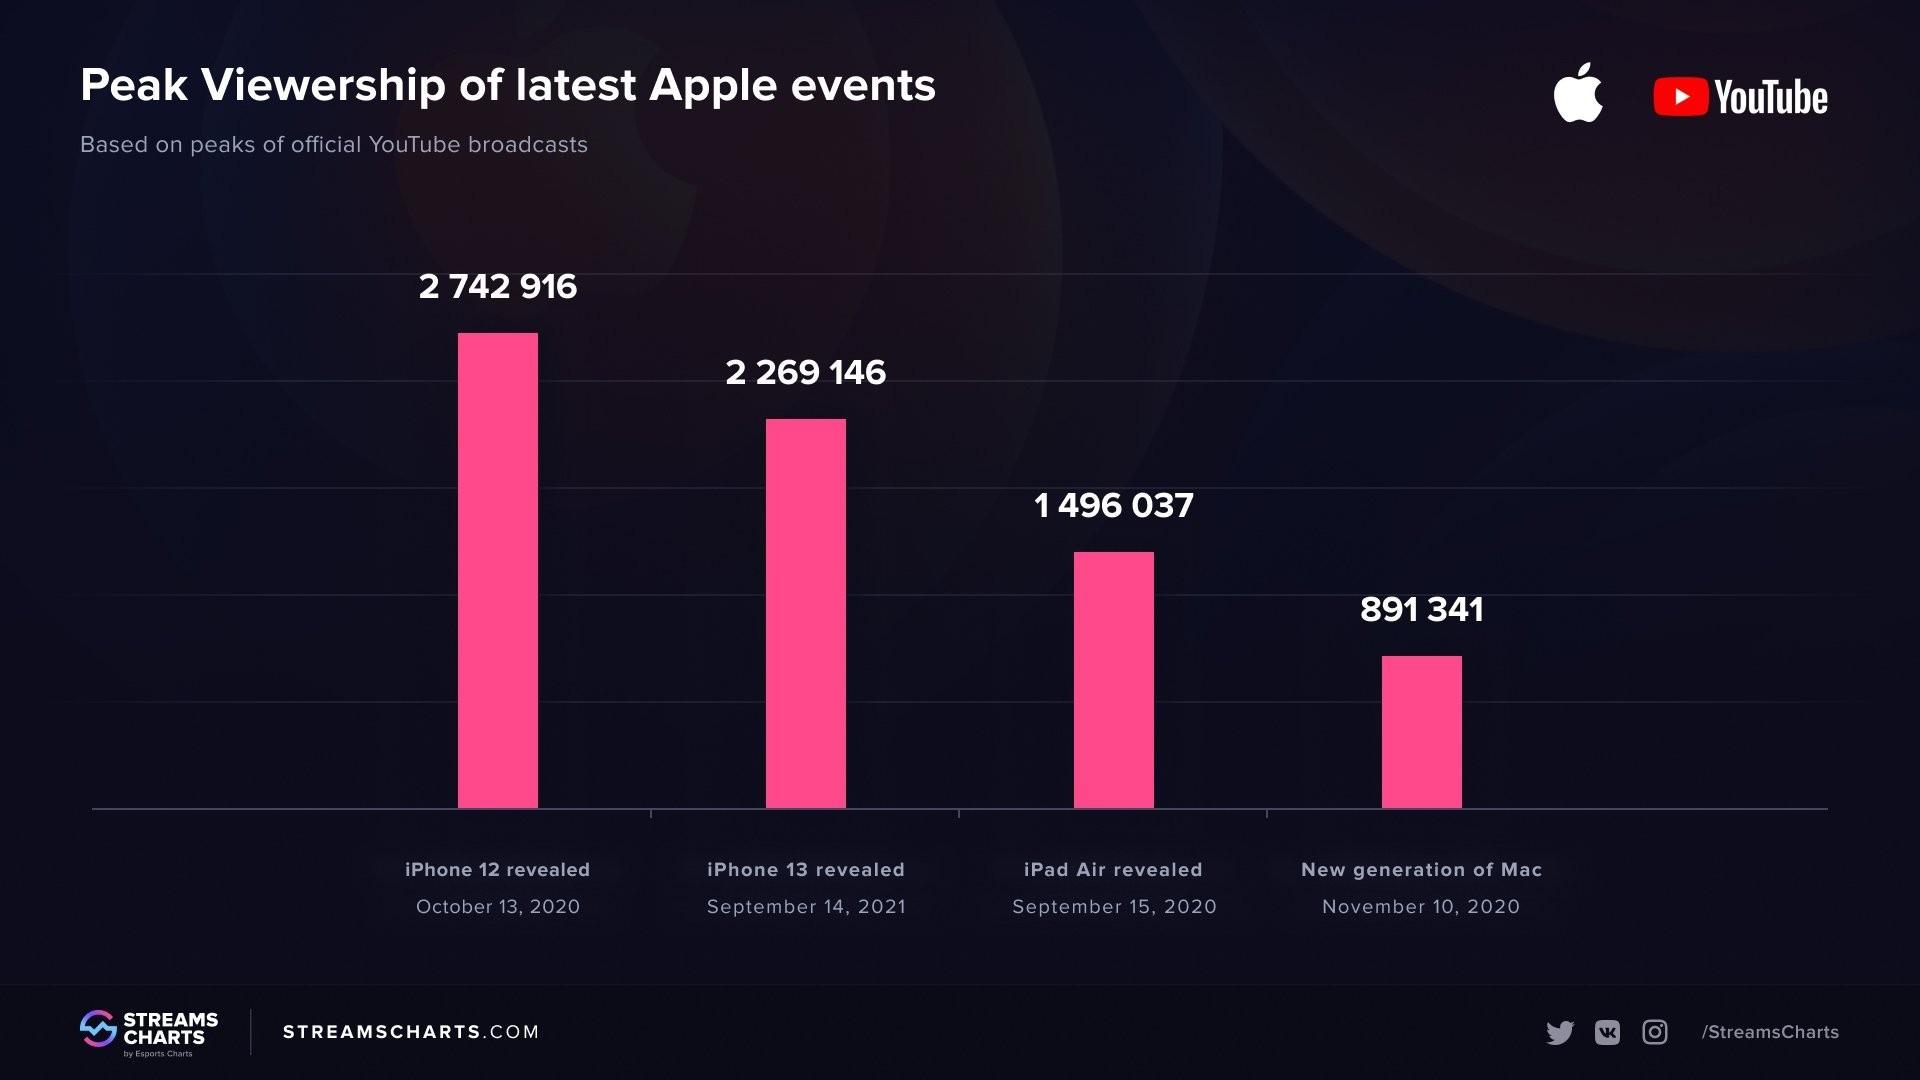 iPhone 12 ждали больше презентация iPhone 13 собрала на 500 тысяч зрителей меньше